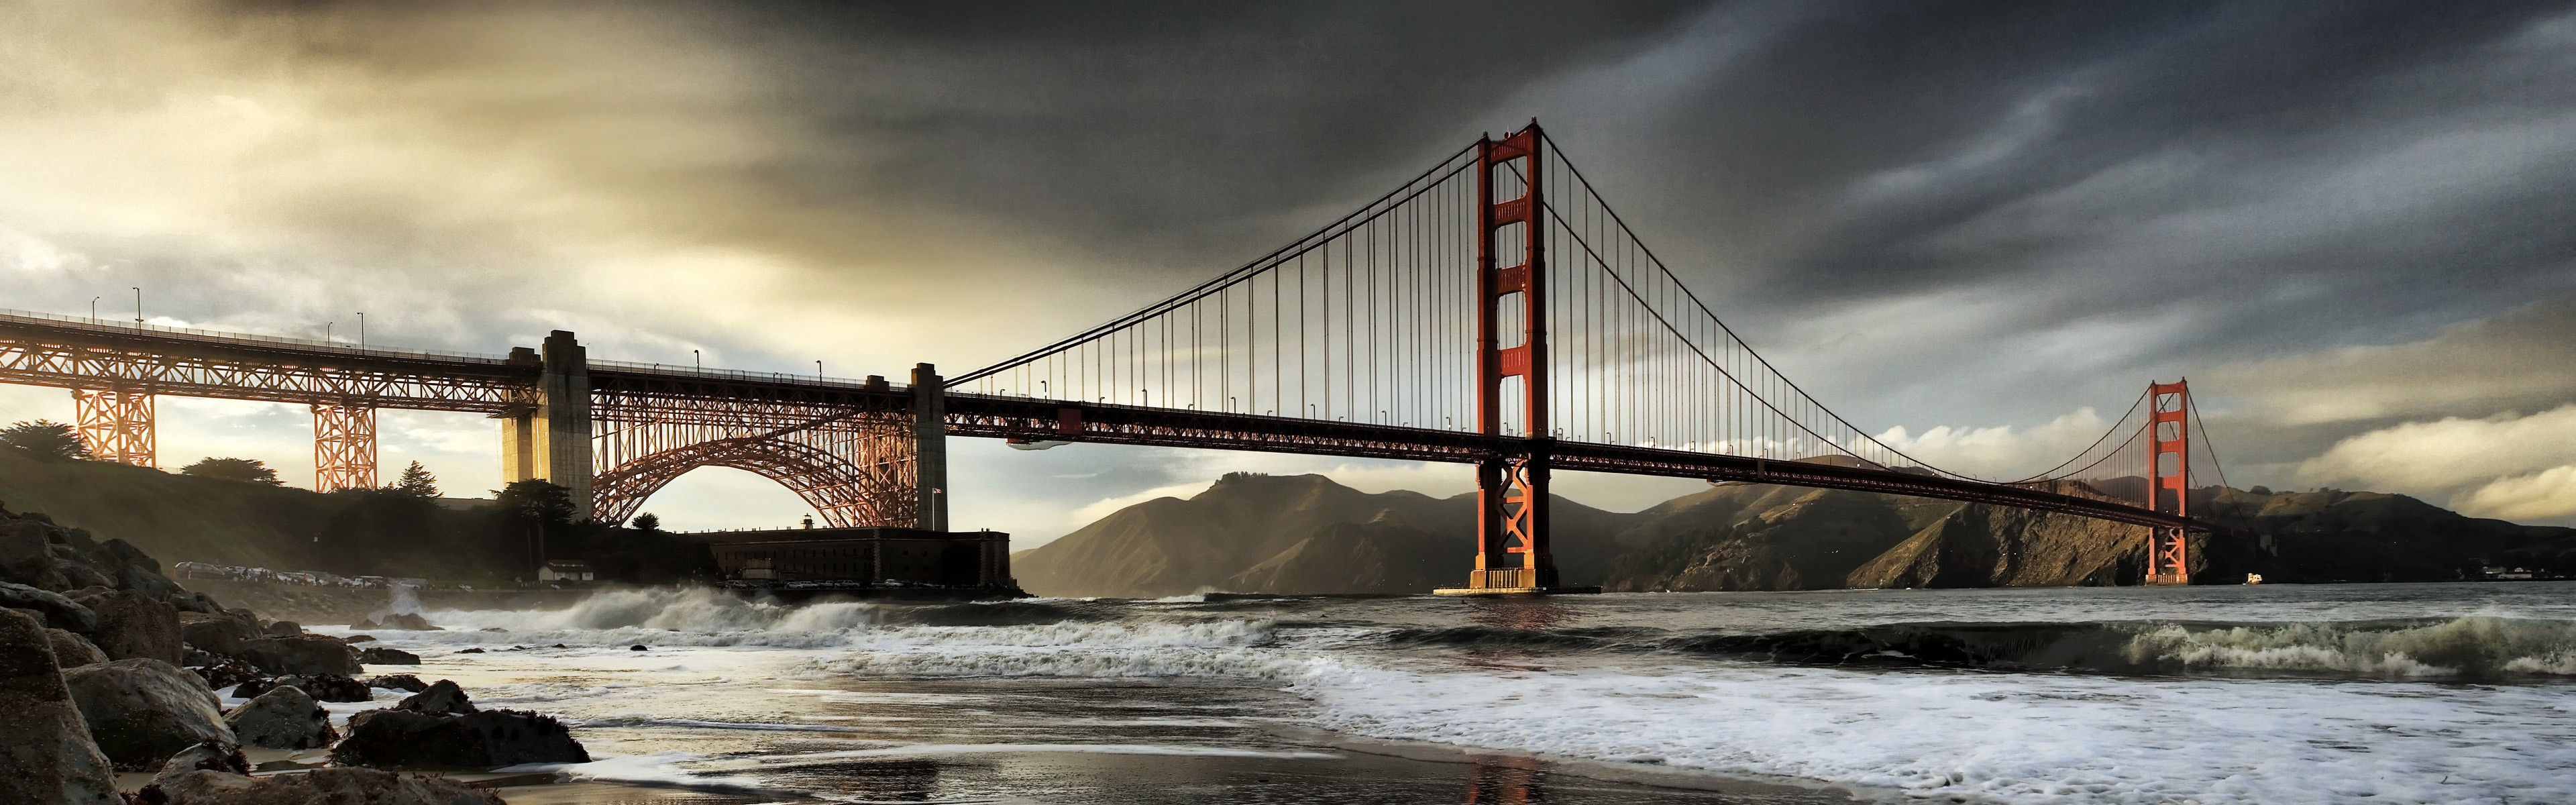 bridge wallpaper collection 28 - photo #16